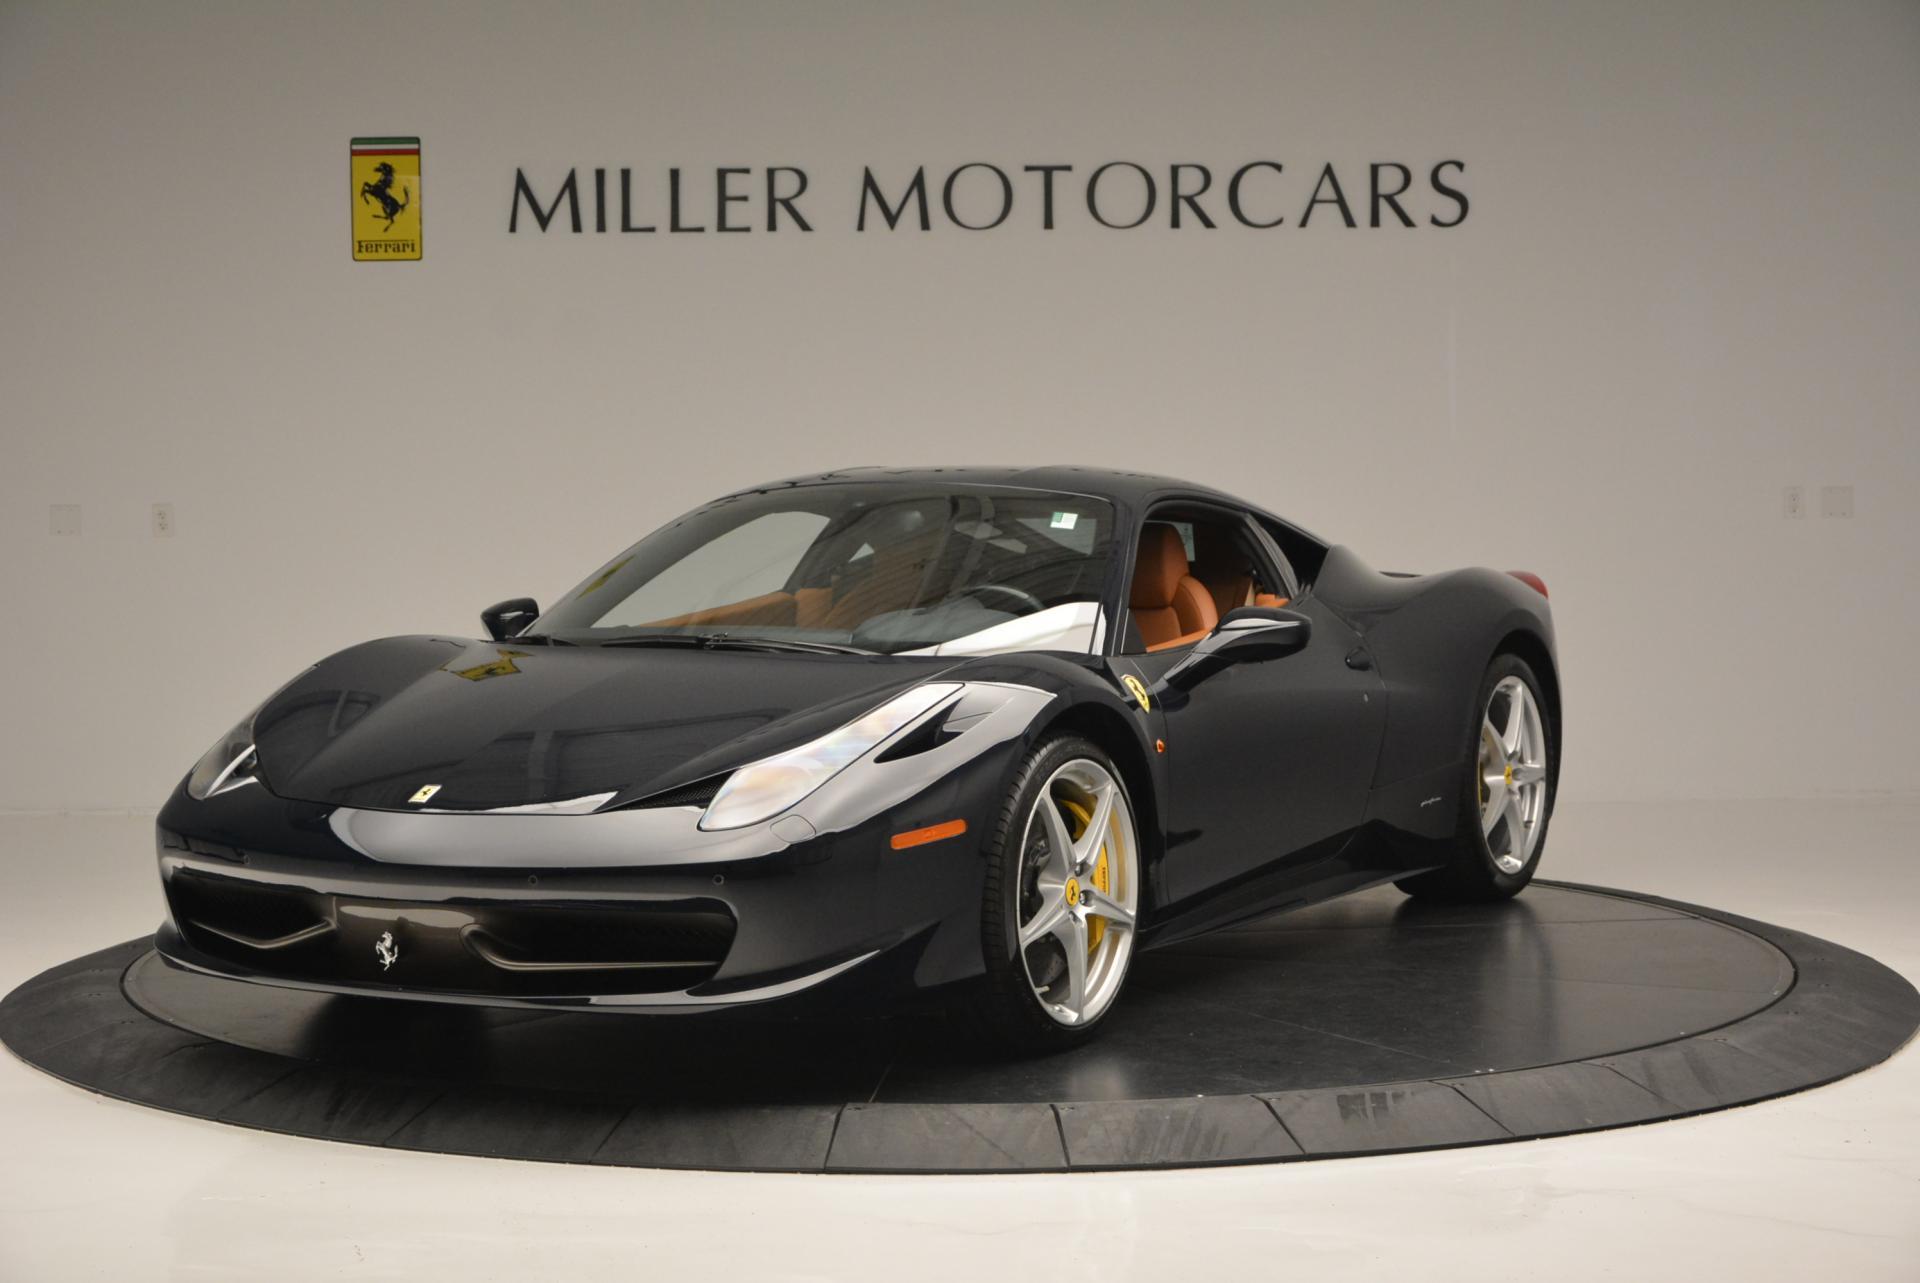 Used 2010 Ferrari 458 Italia for sale Sold at Pagani of Greenwich in Greenwich CT 06830 1